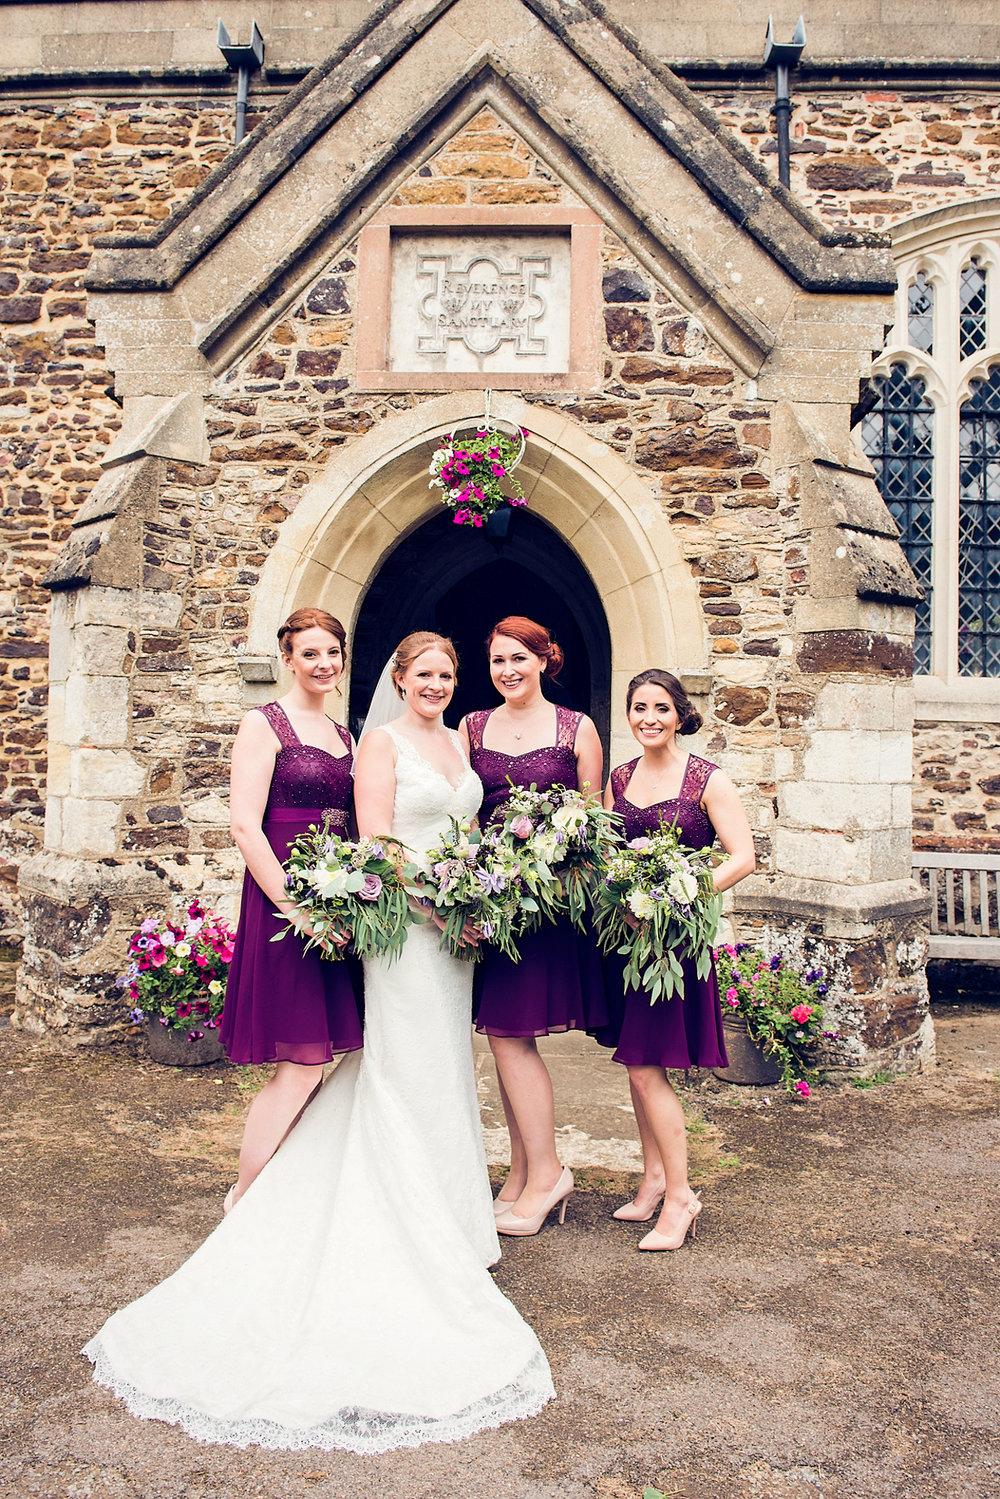 Wedding-Photographer-Award-flaxbourne-gardens-milton-keynes-bedfordshire-m1-luton-014.jpg